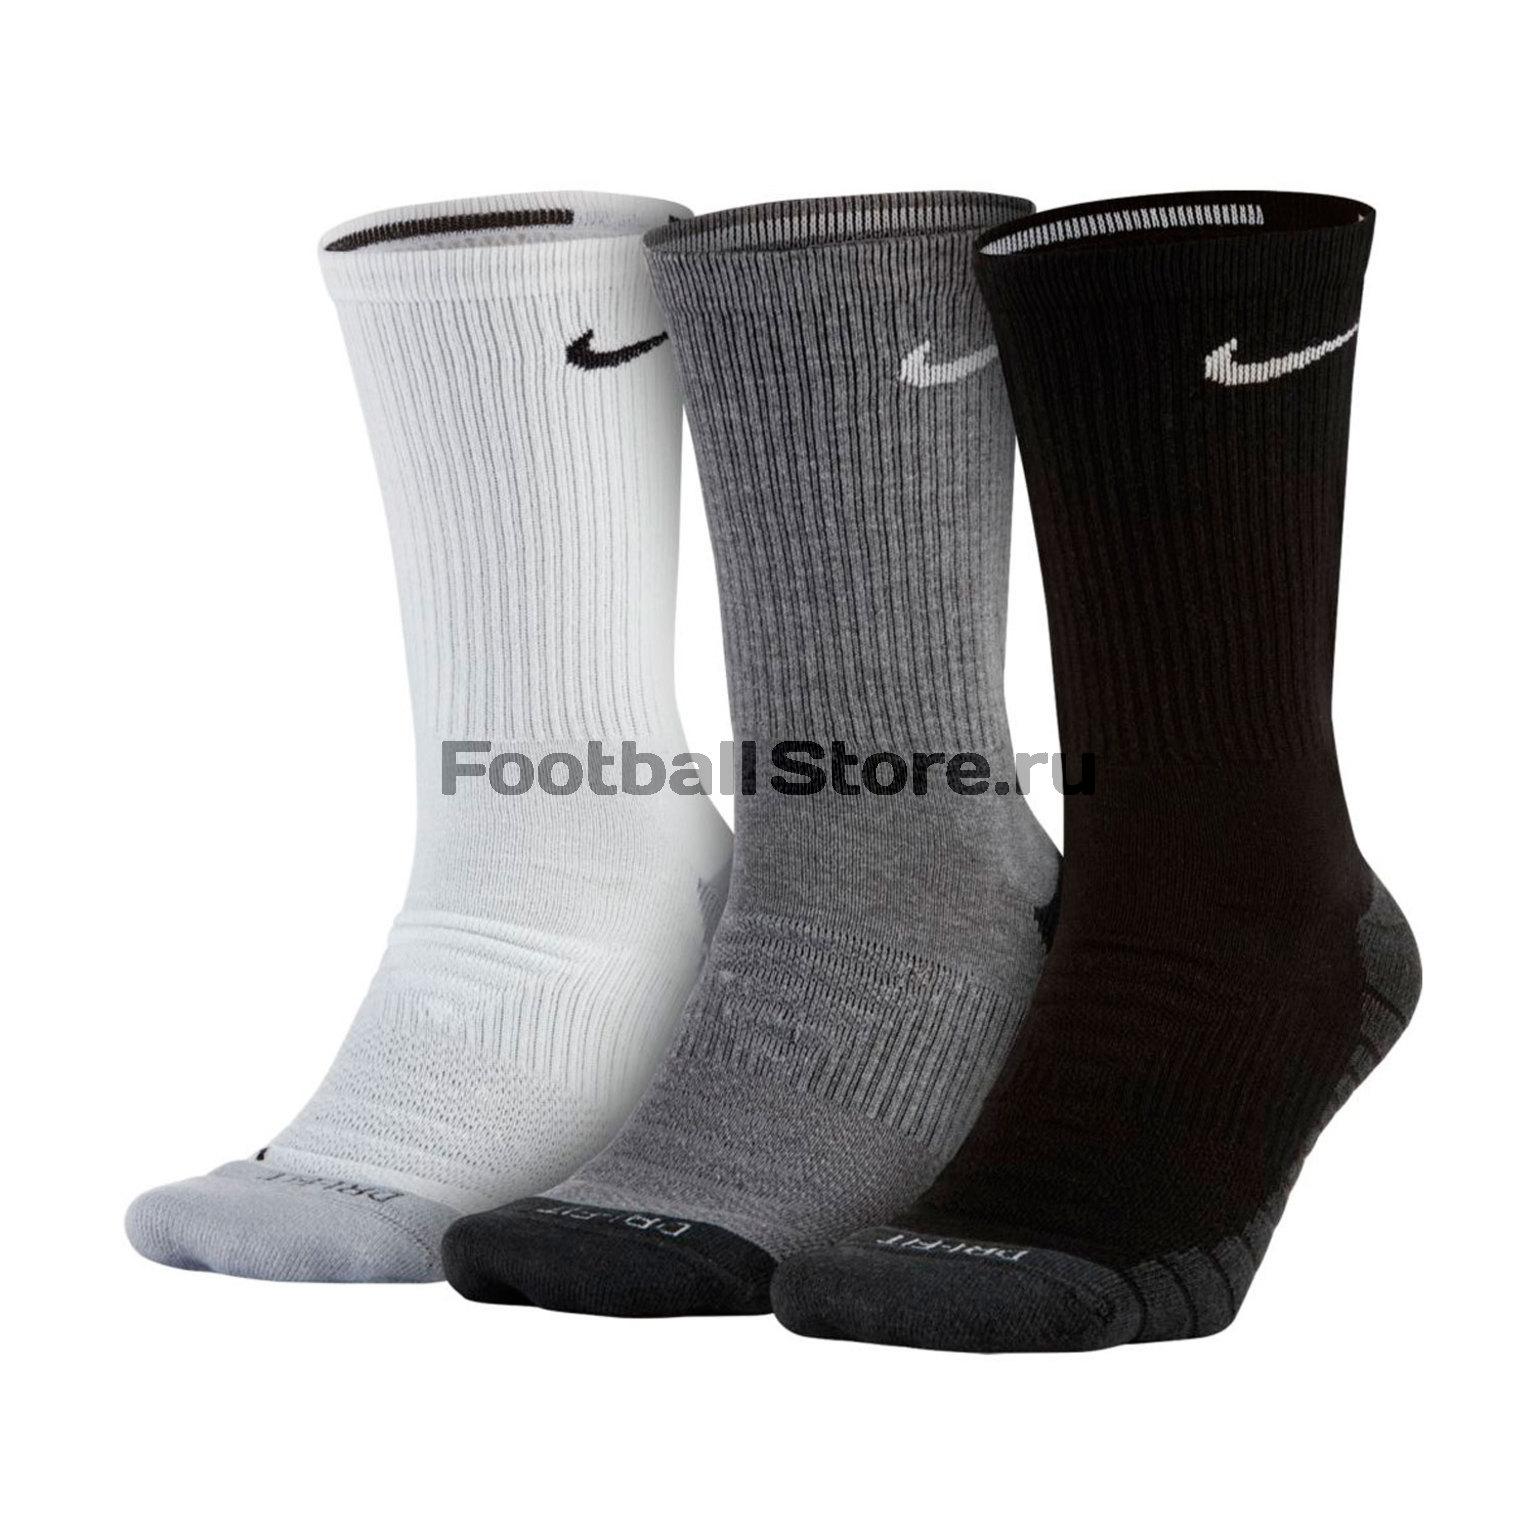 6748b121 Комплект носков Nike 3PPK Dri-Fit Cushion Crew SX5547-900 – купить в  интернет магазине footballstore, цена, фото